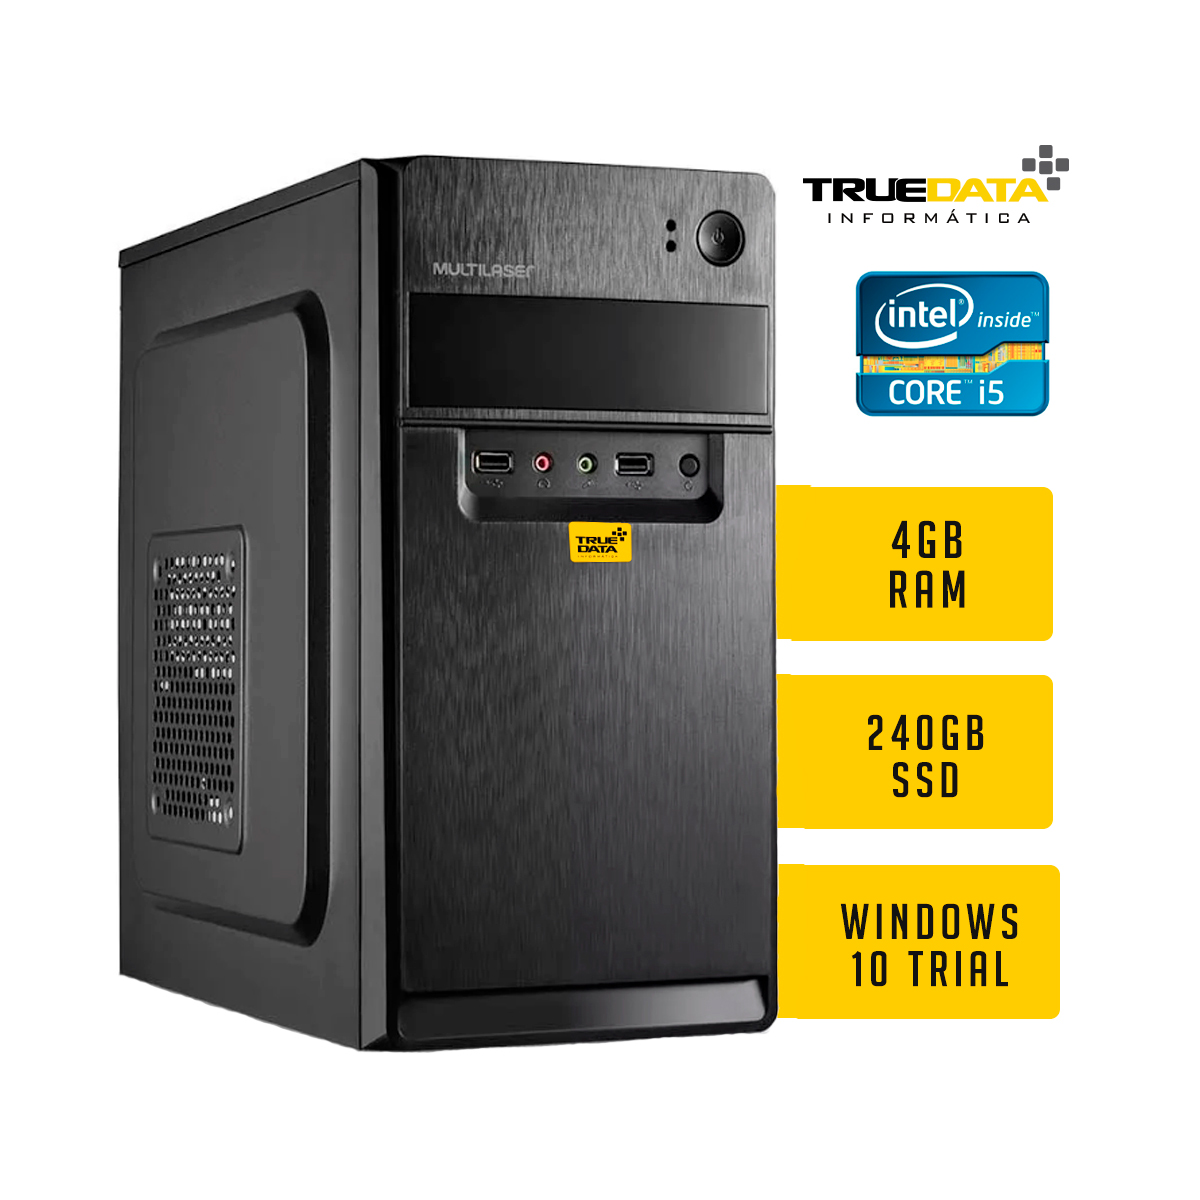 Computador Desktop True Data Intel Core I5-3470 3.2ghz 4gb Ssd 240gb Win10 Trial